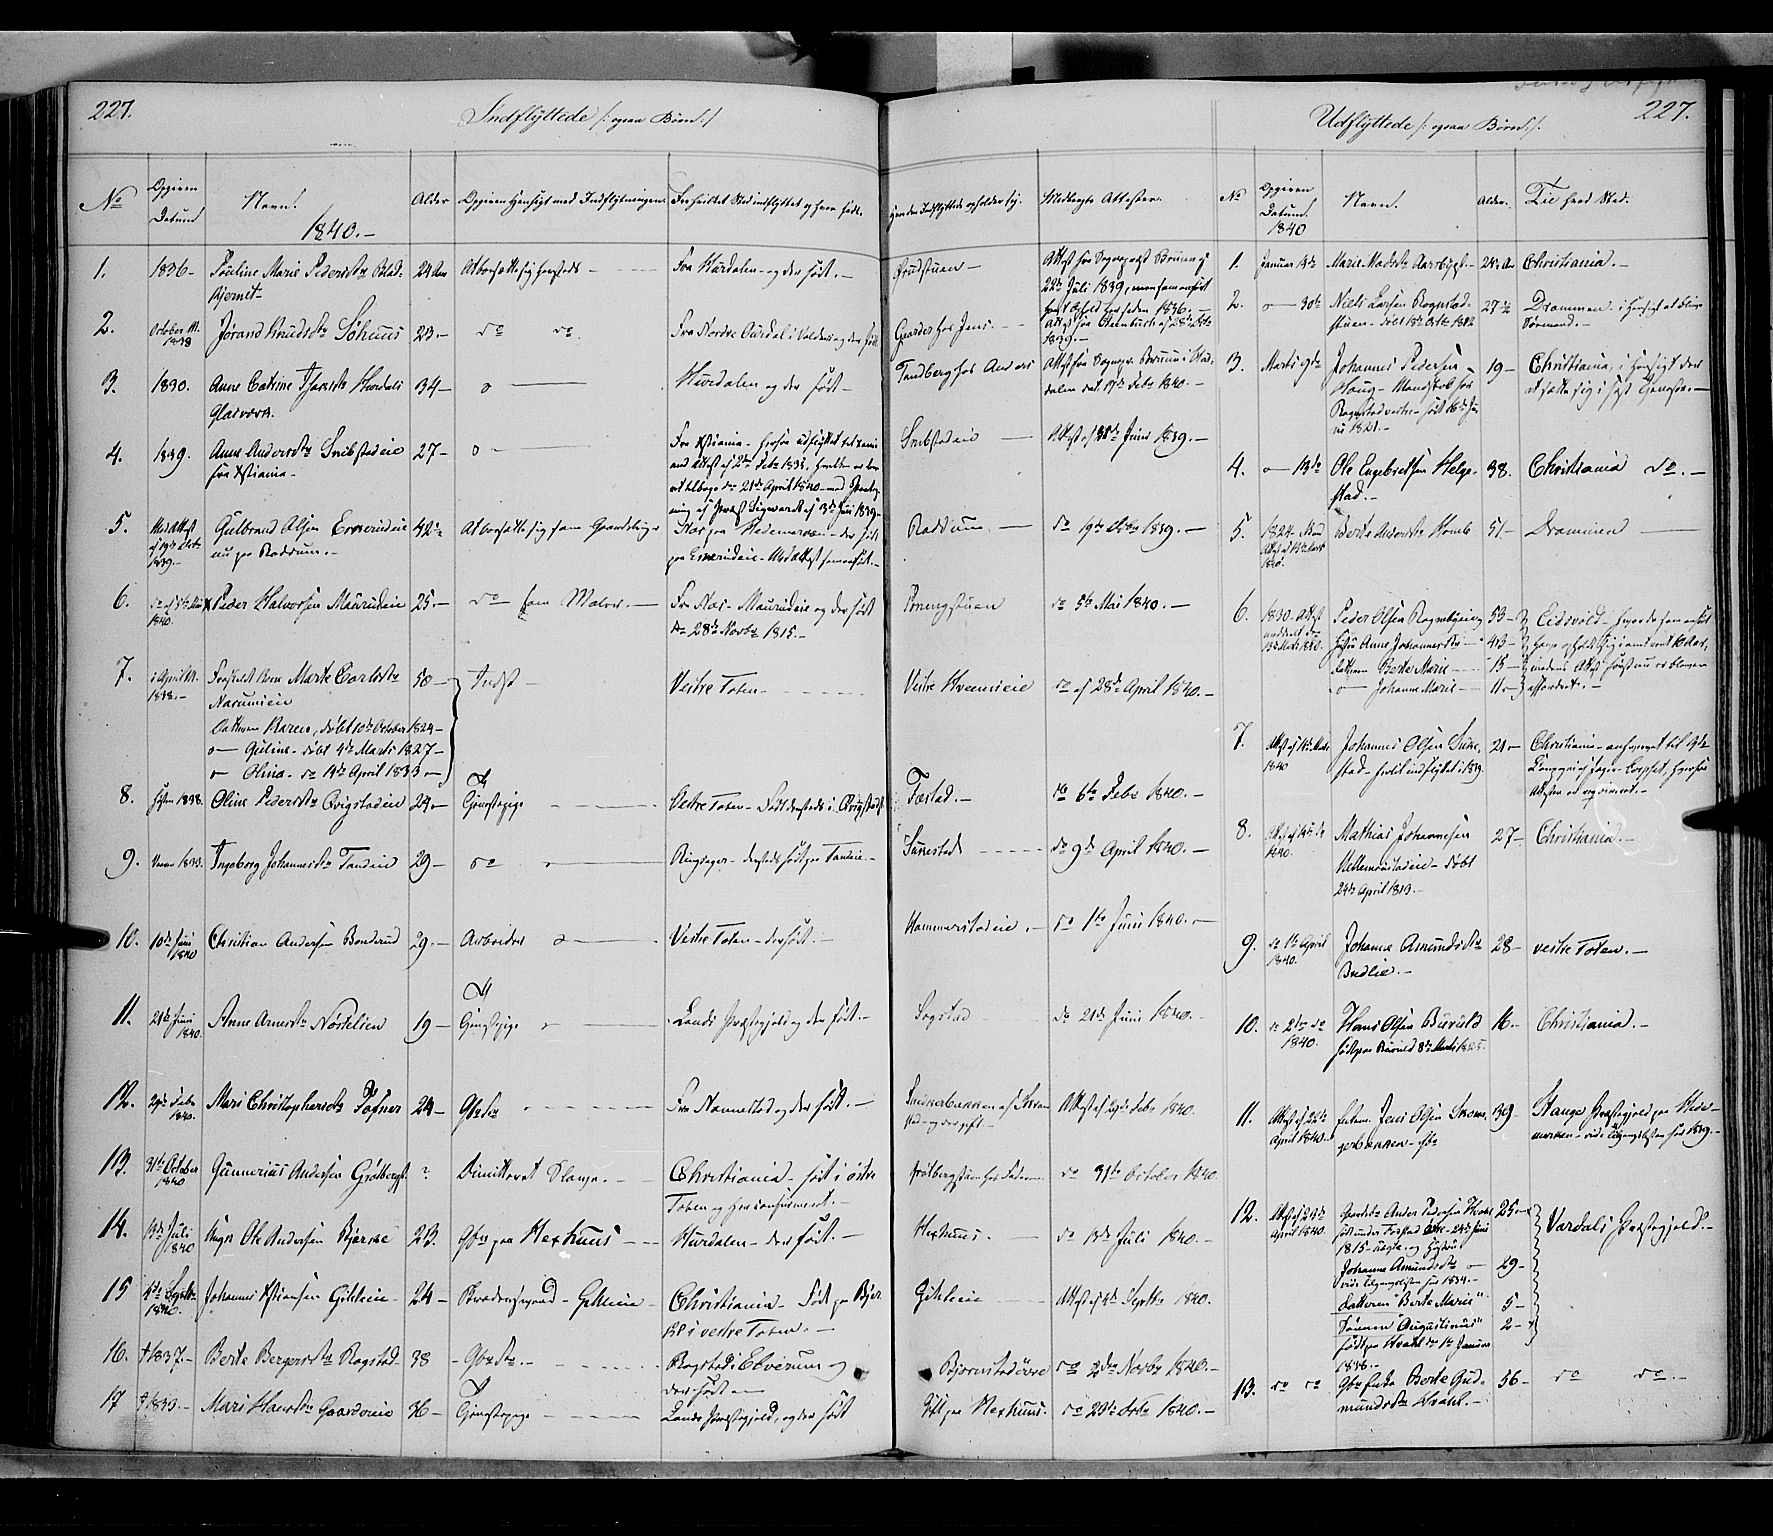 SAH, Østre Toten prestekontor, Ministerialbok nr. 2, 1840-1847, s. 227